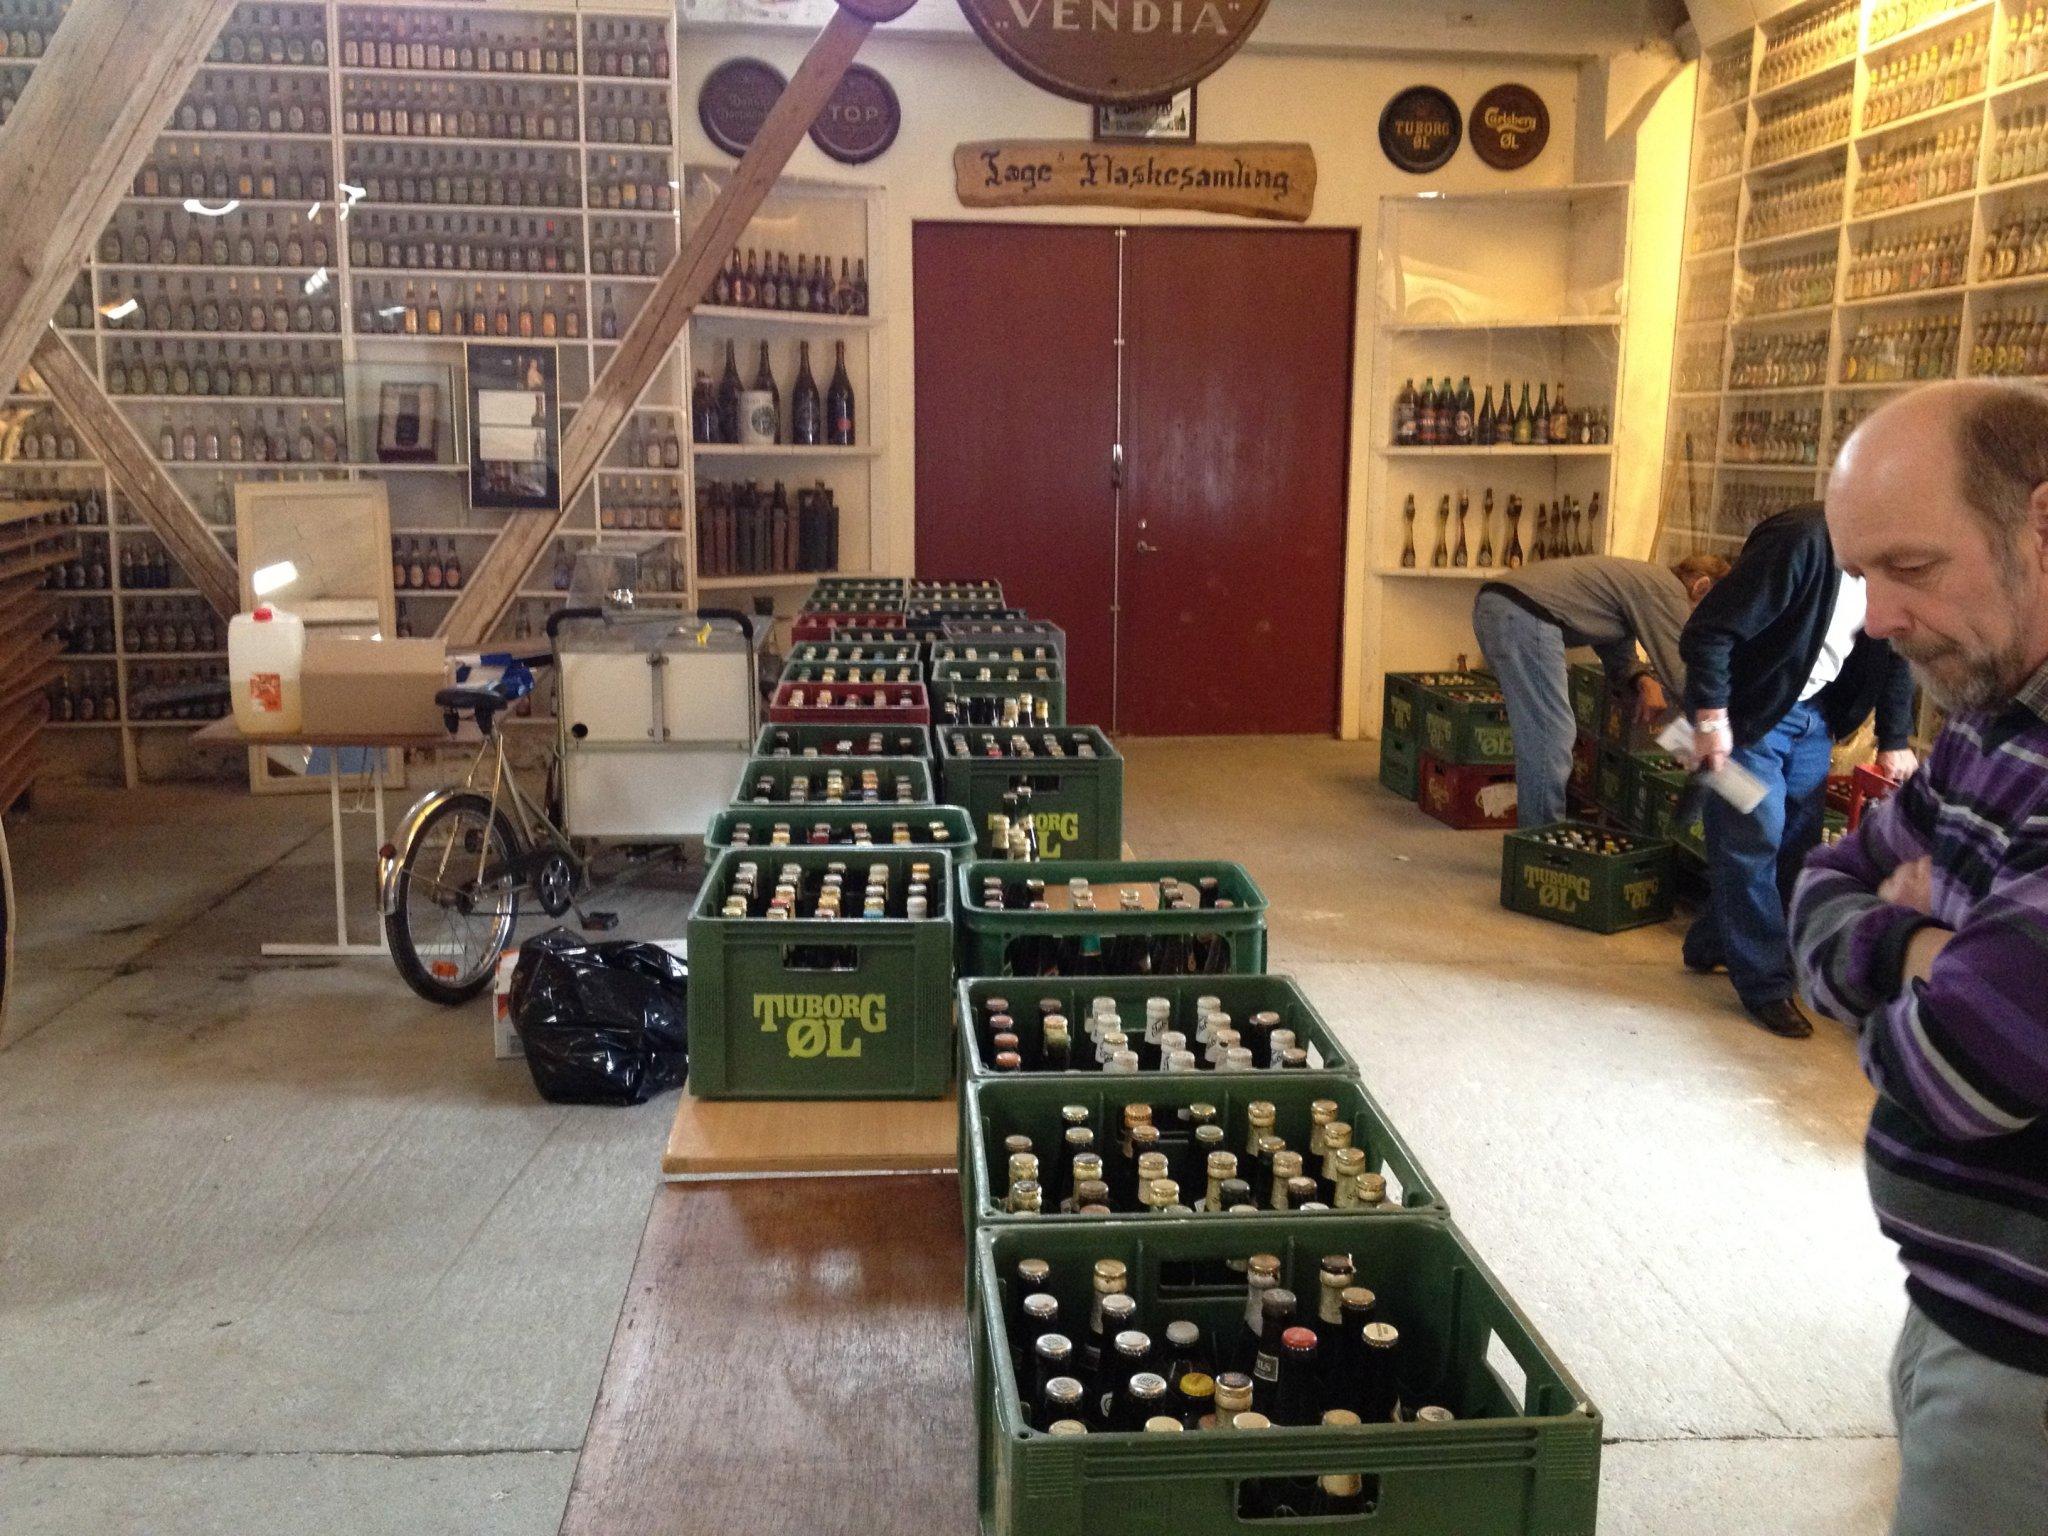 danske ølsamlere